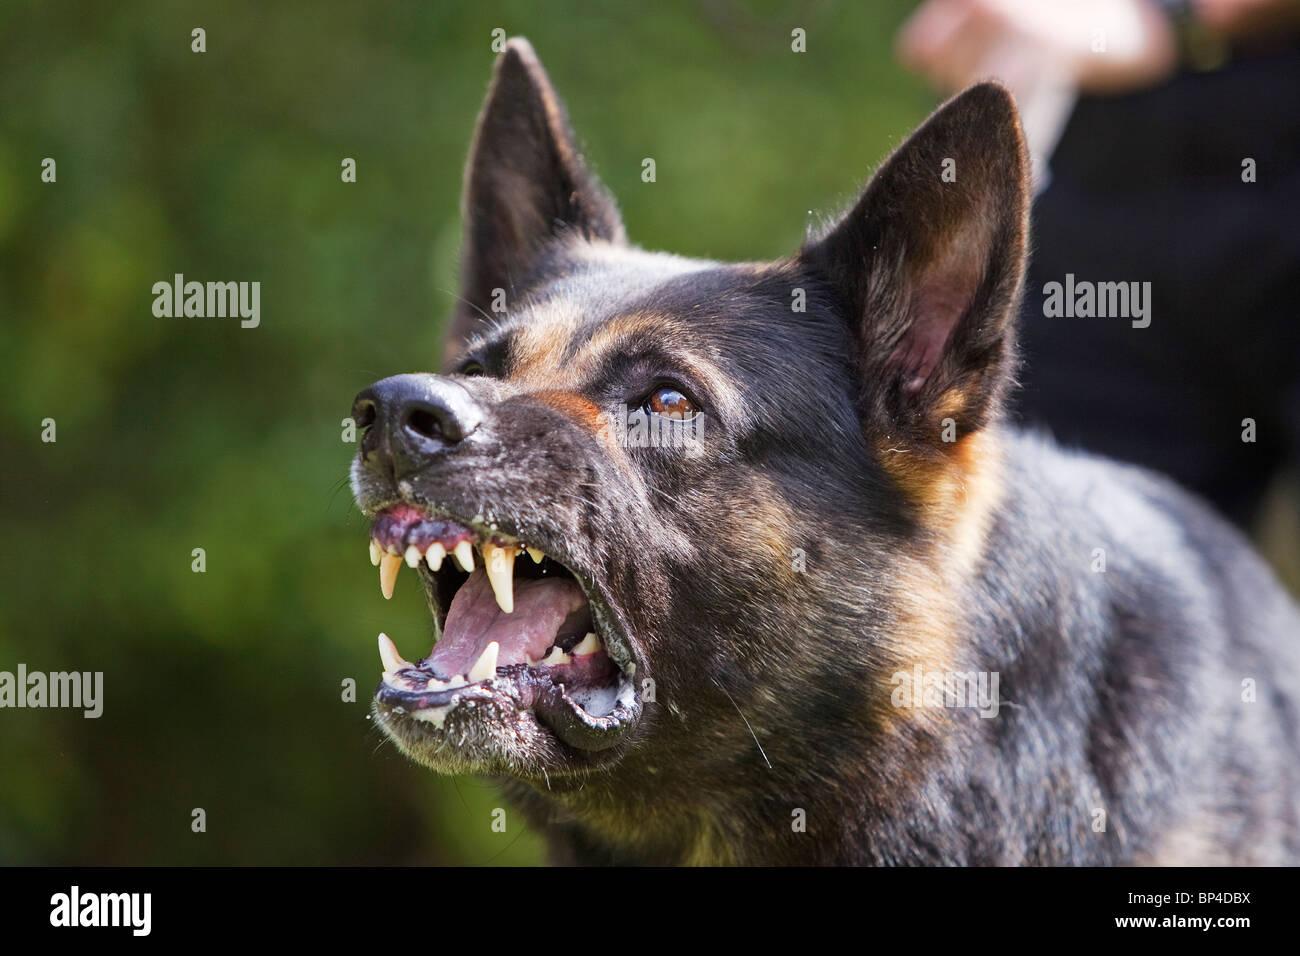 A former prison service German Shepherd working dog showing aggressive behaviour Stock Photo